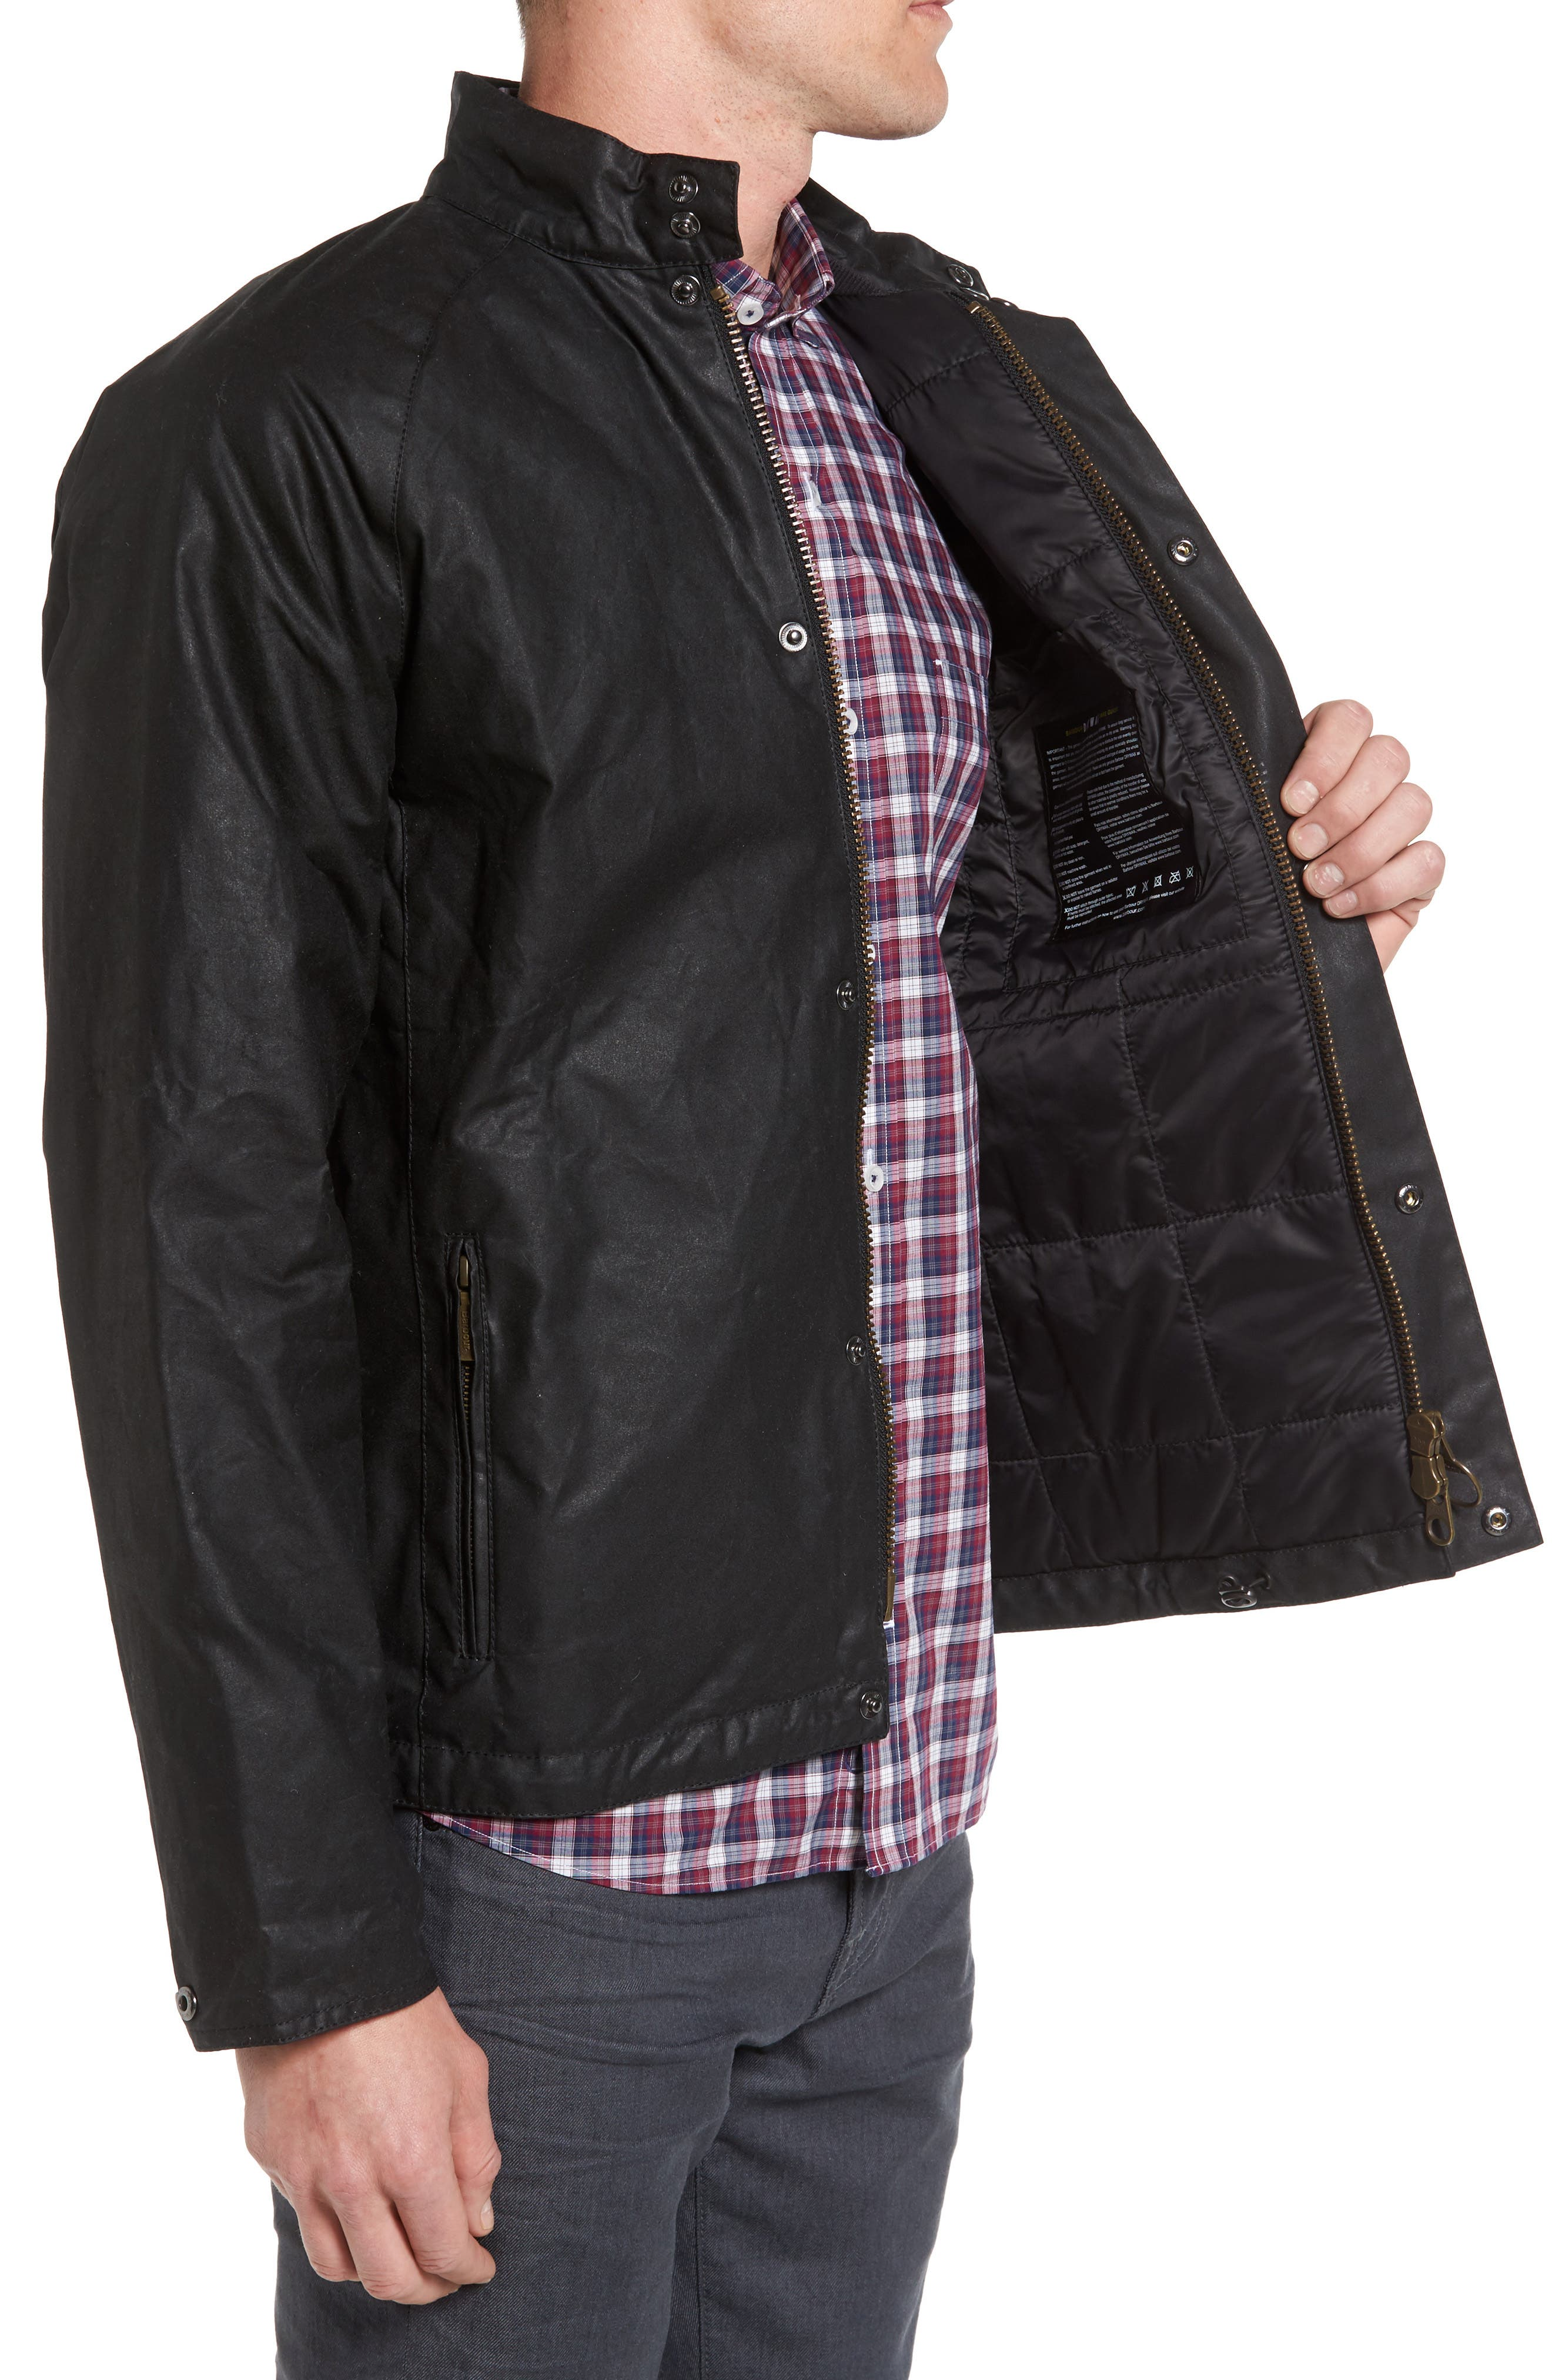 Chrome Slim Fit Water Repellent Jacket,                             Alternate thumbnail 3, color,                             Black